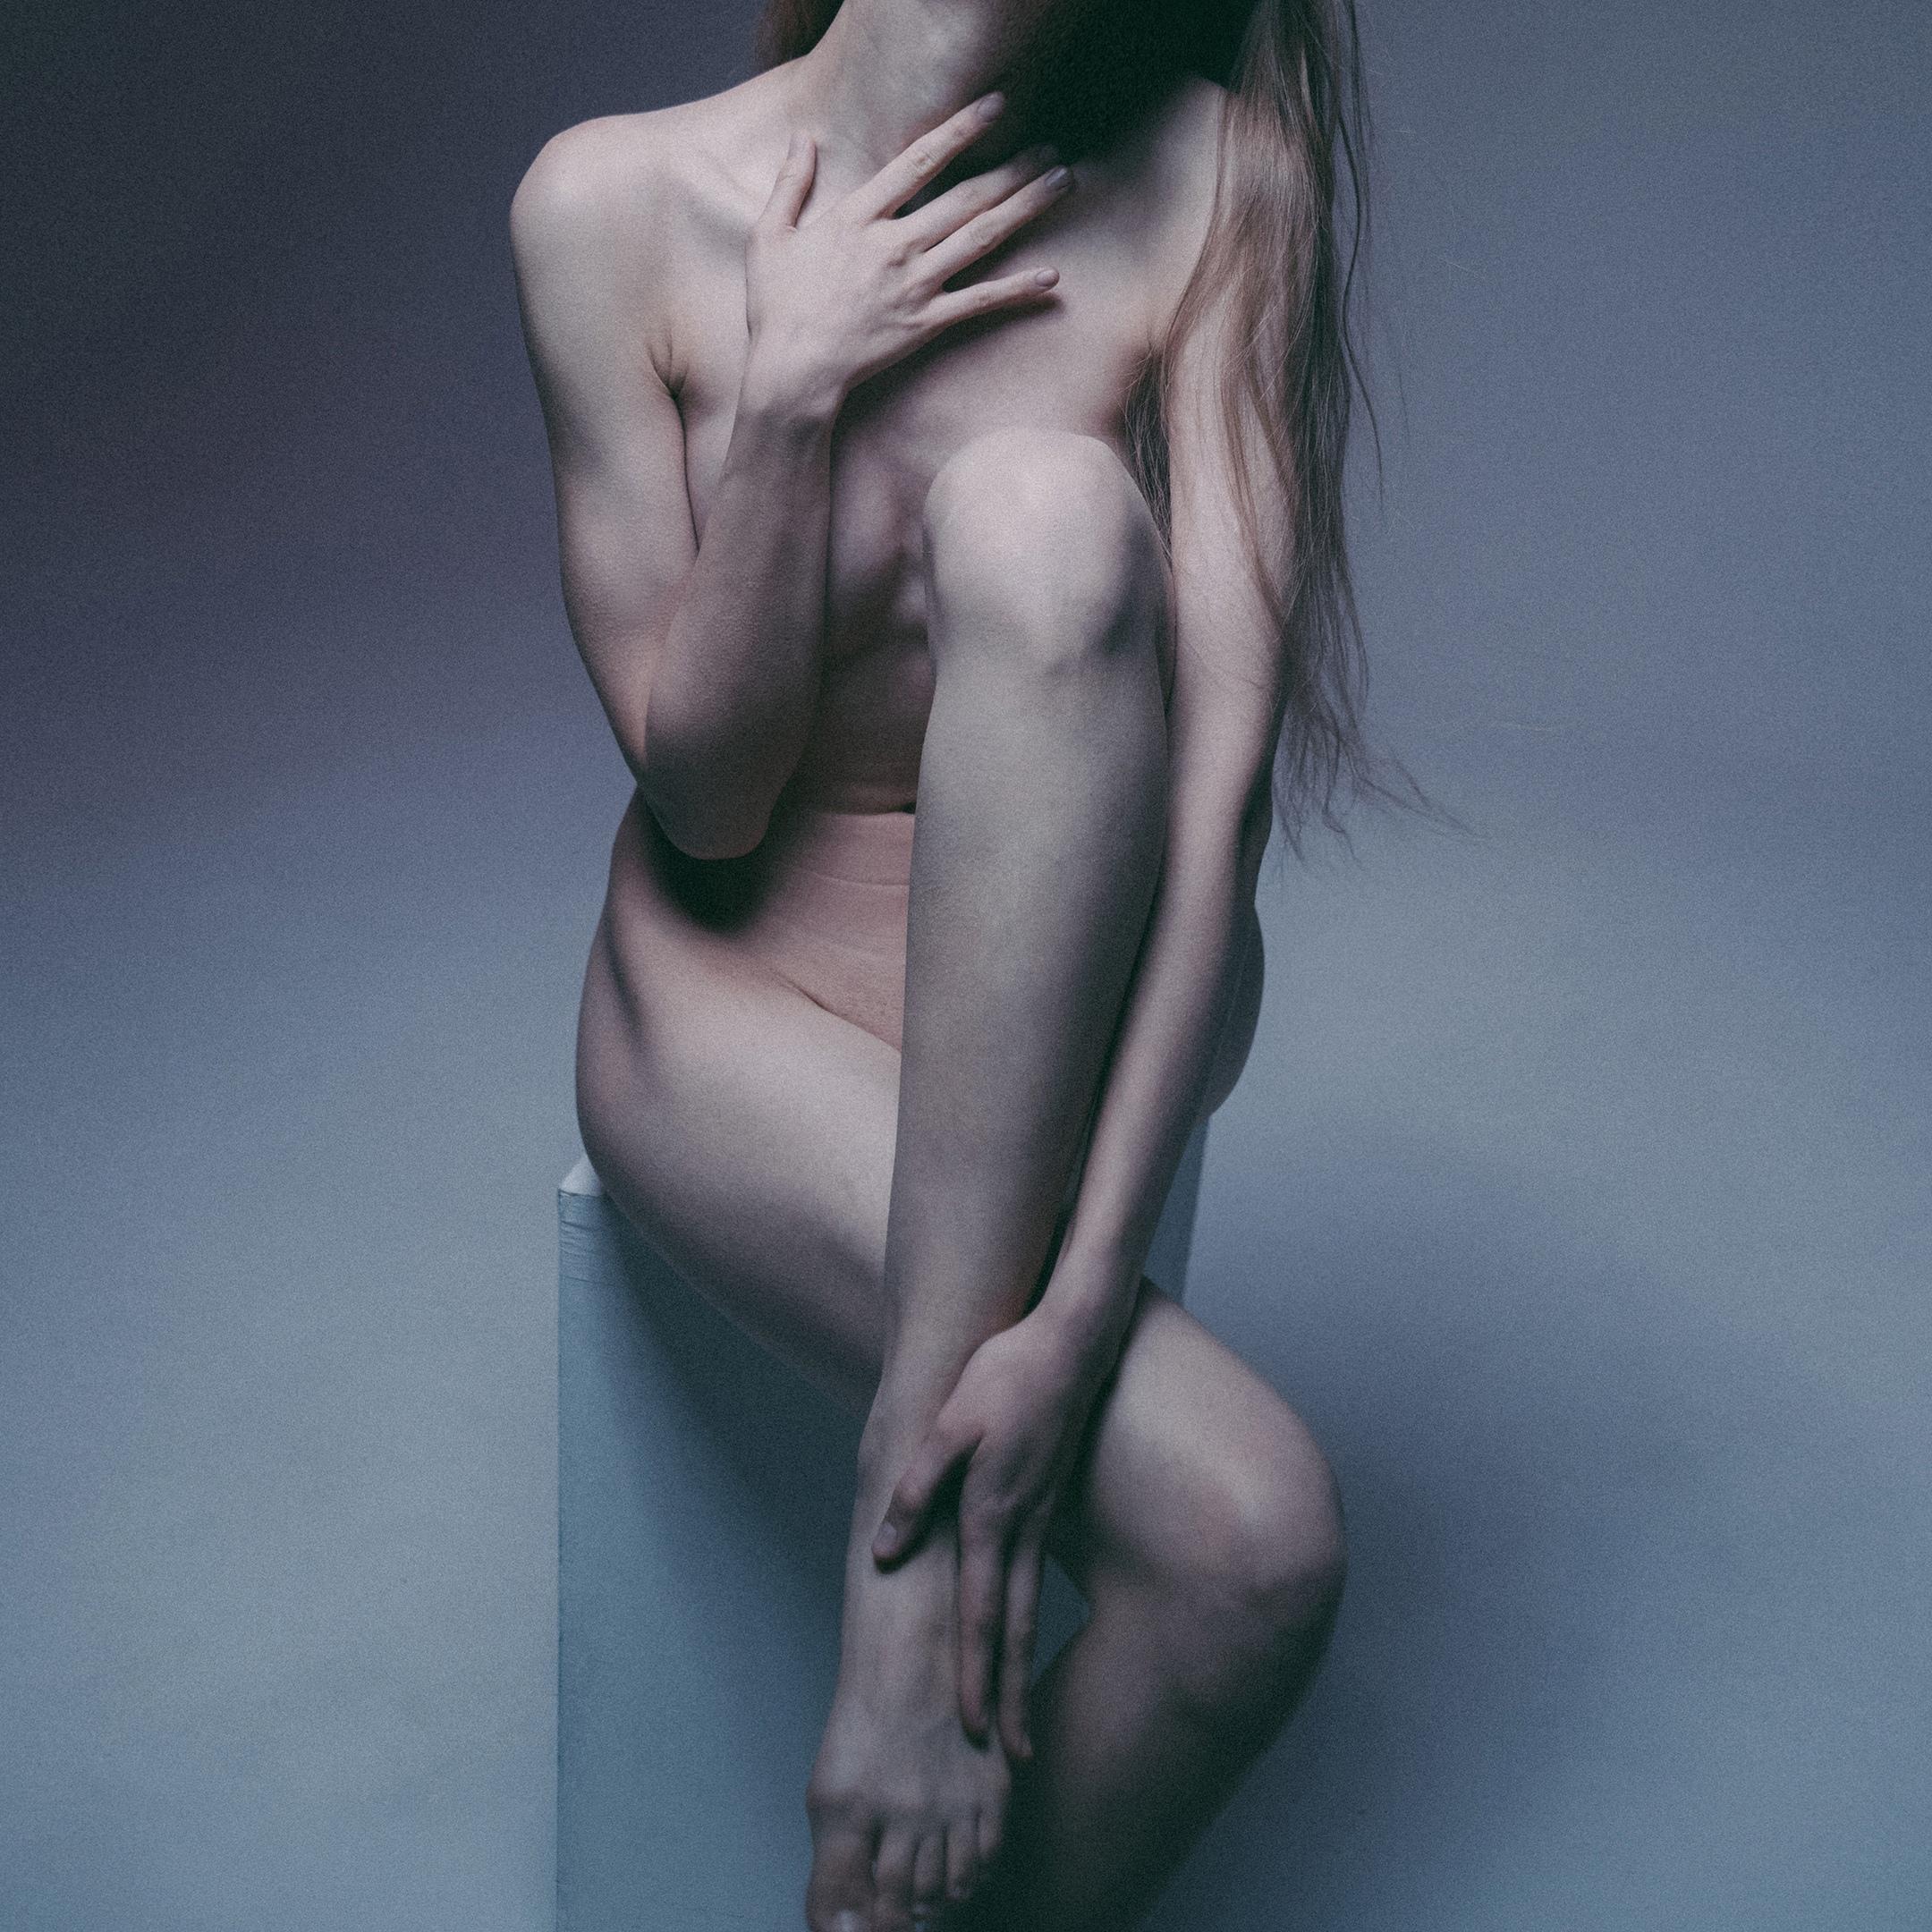 https://www.youngfolks.ru/pub/photographer-sasha-demidova-114786